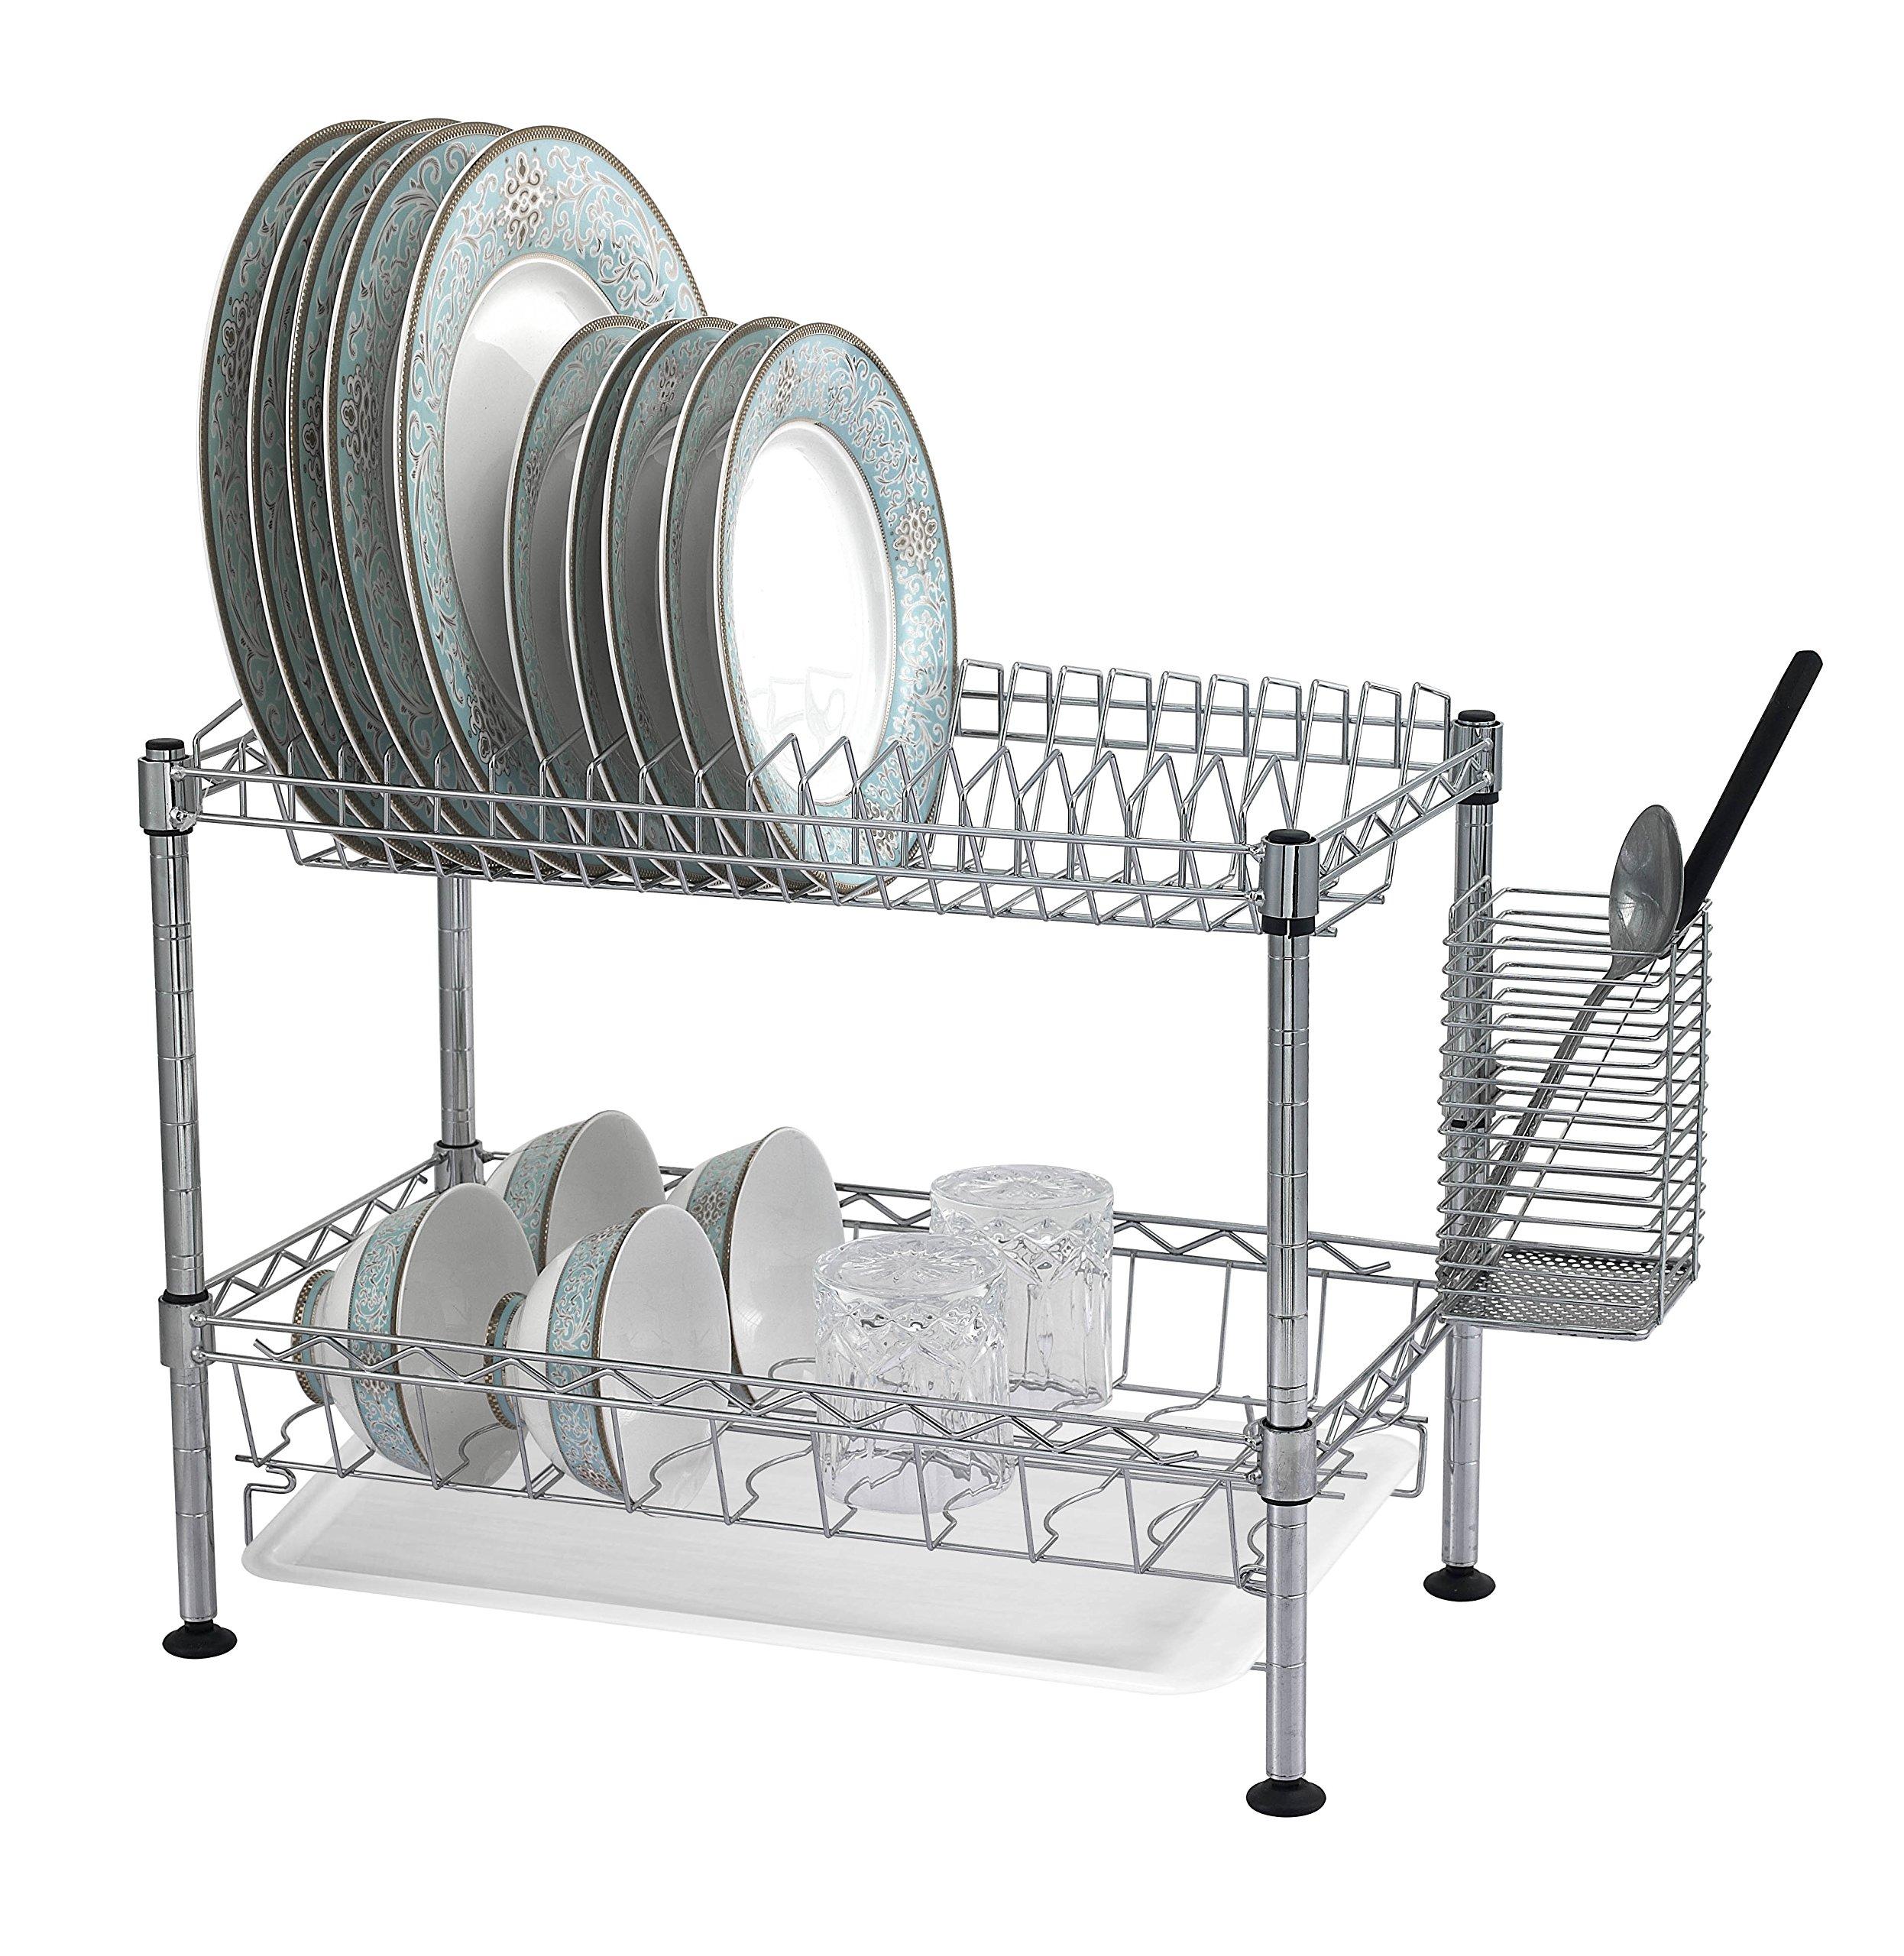 Cheap Chrome Dish Rack, find Chrome Dish Rack deals on line at ...